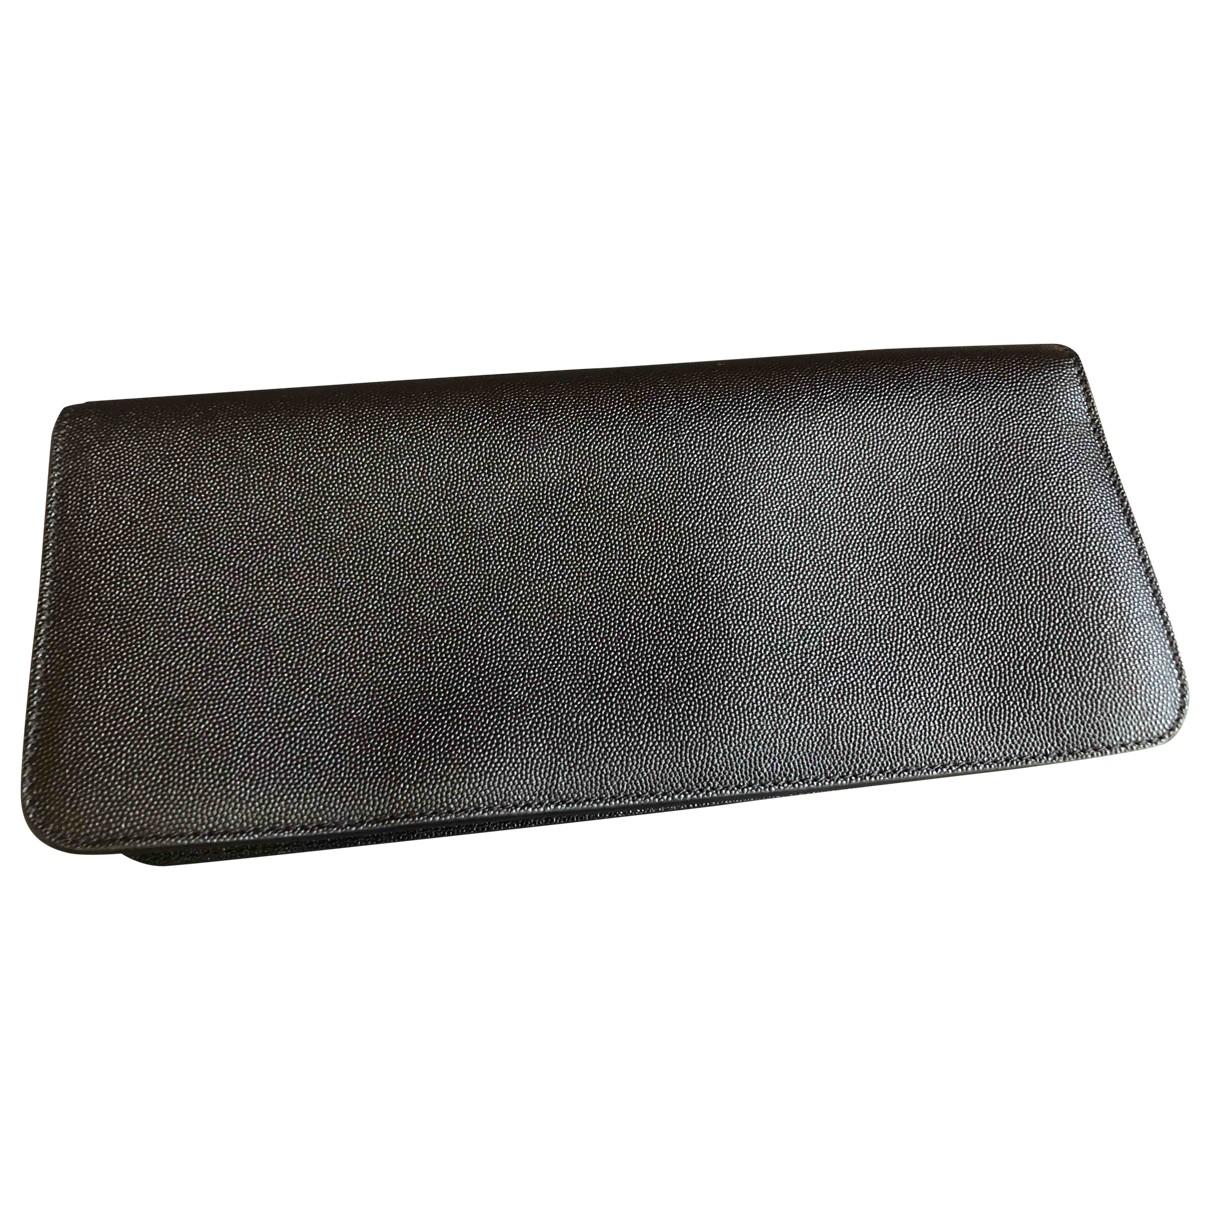 Tom Ford \N Black Leather Clutch bag for Women \N